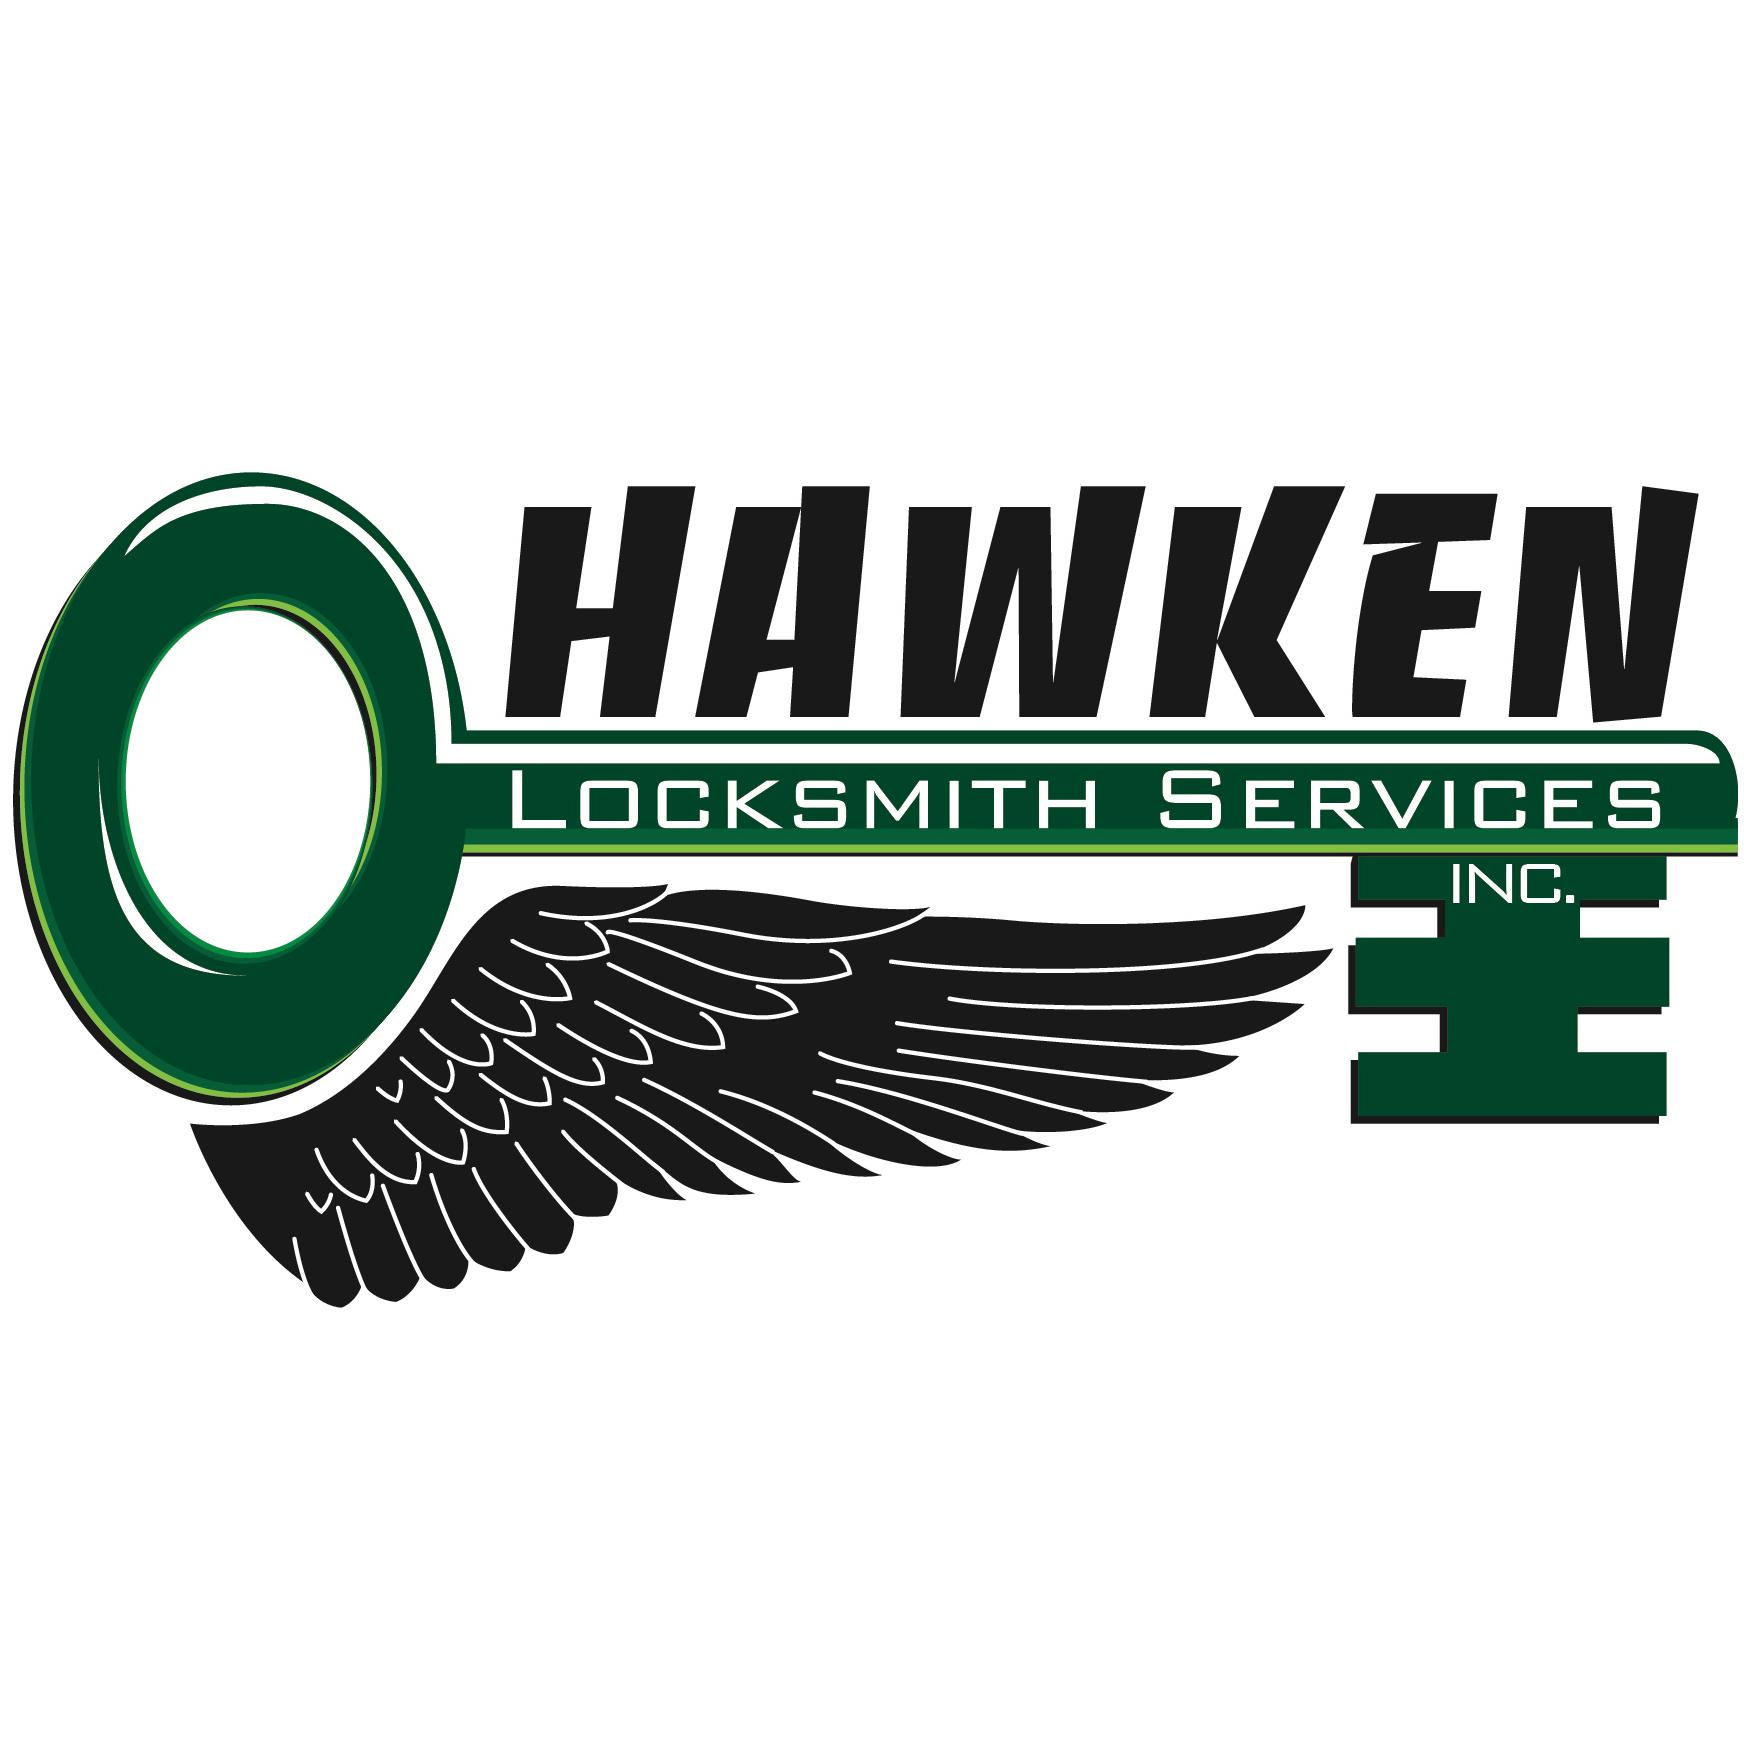 Hawken Locksmith Services Inc. image 10